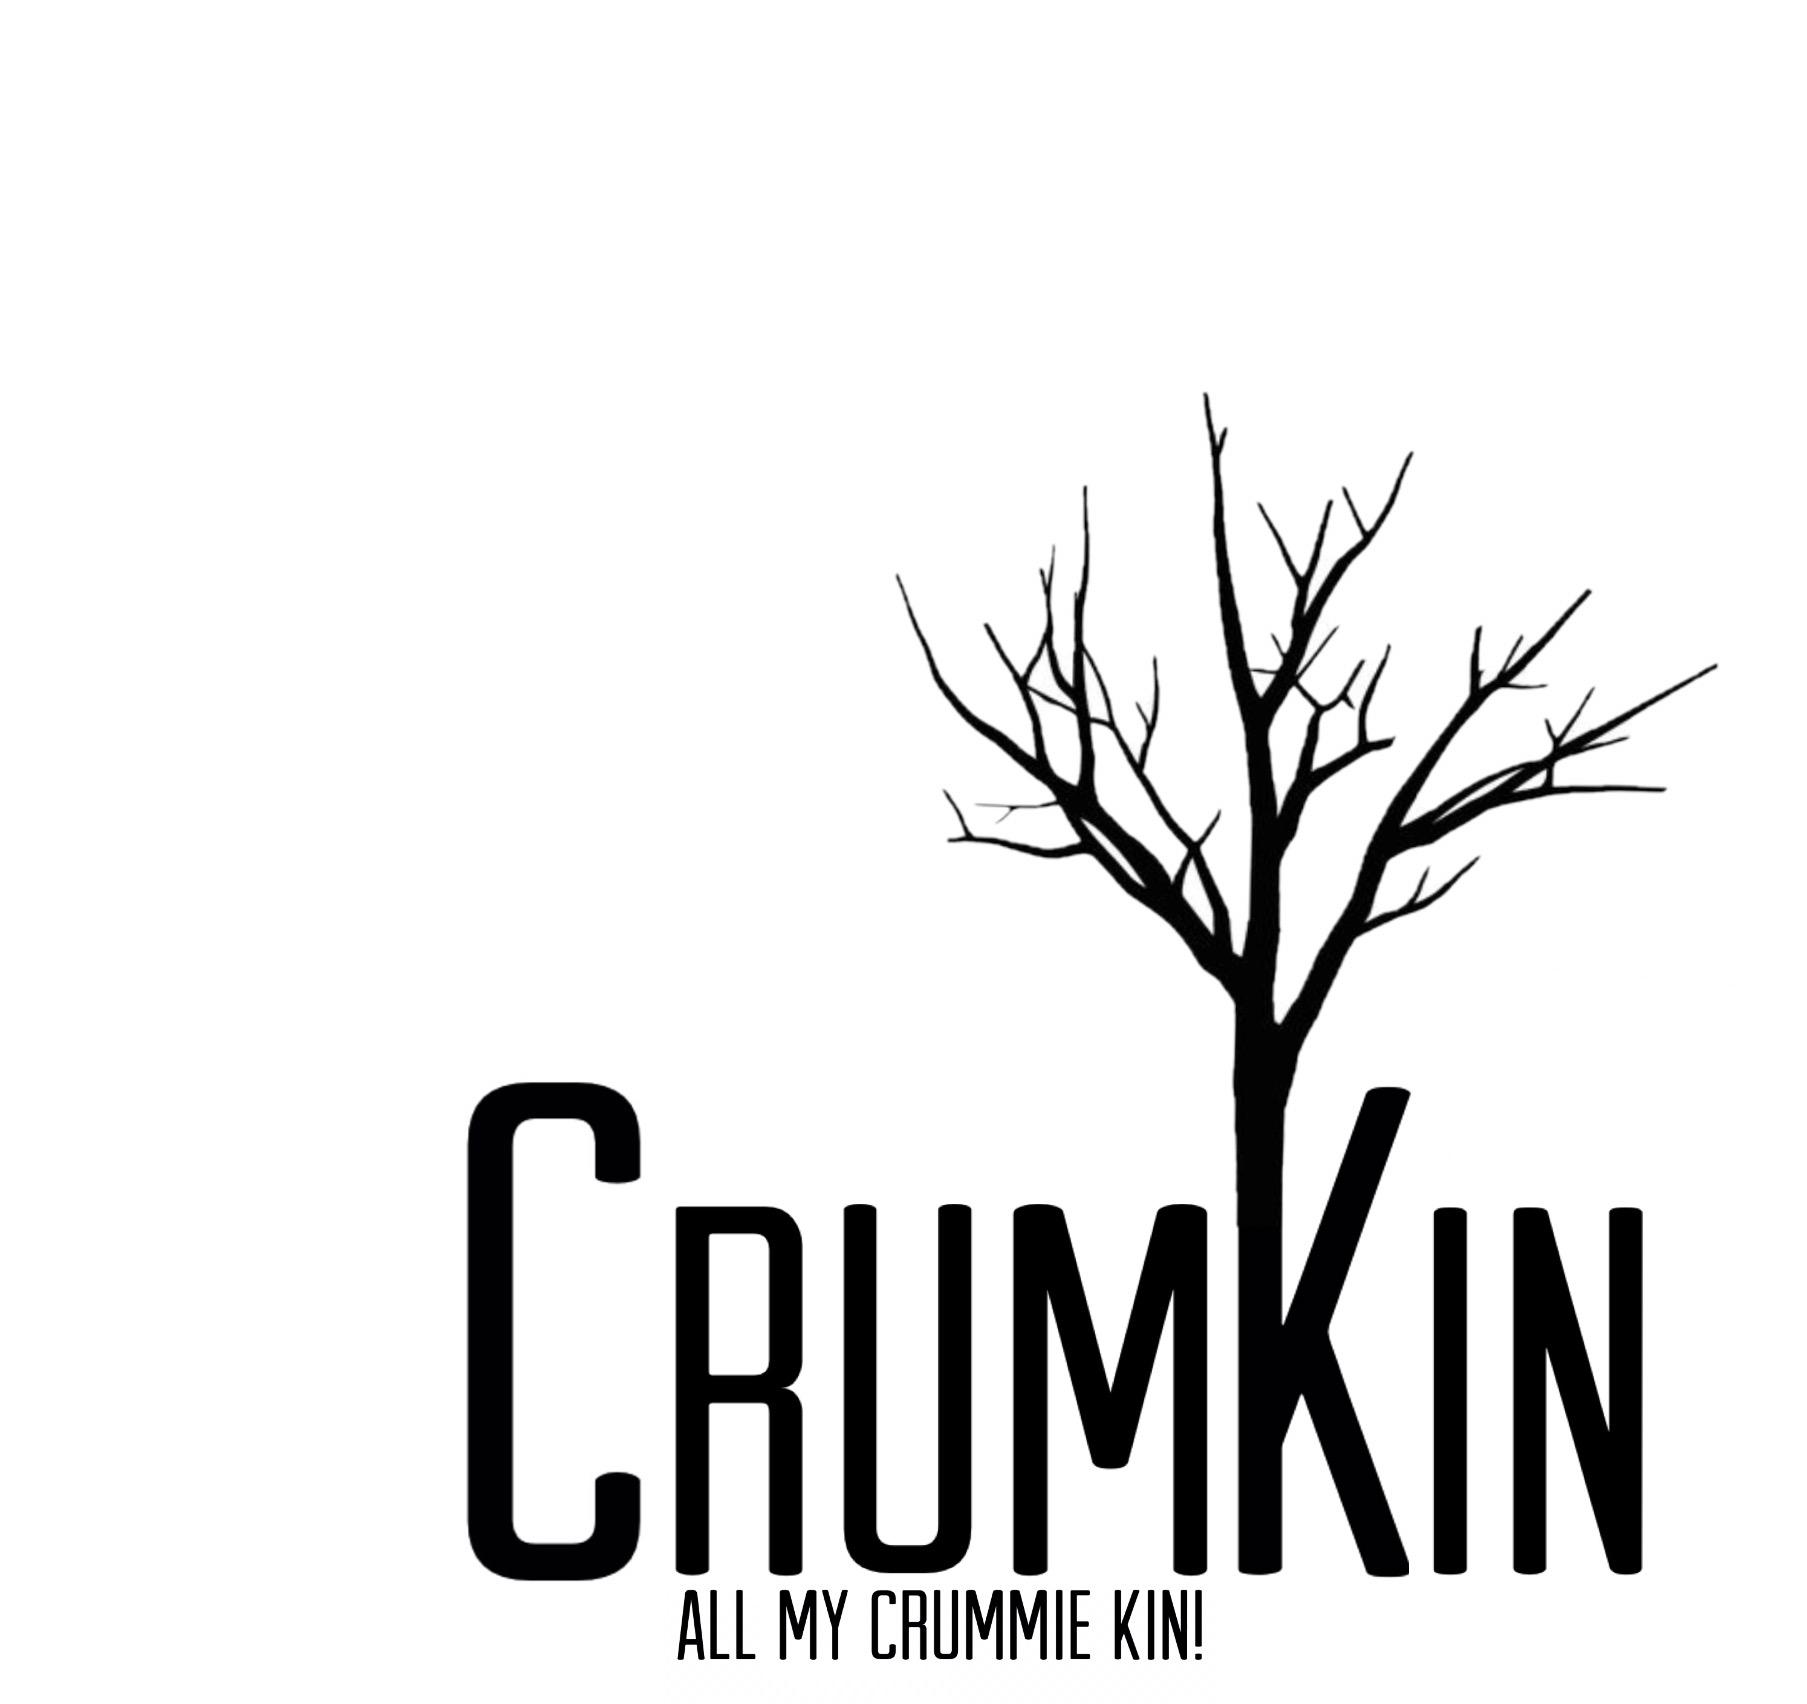 CrumKin.com